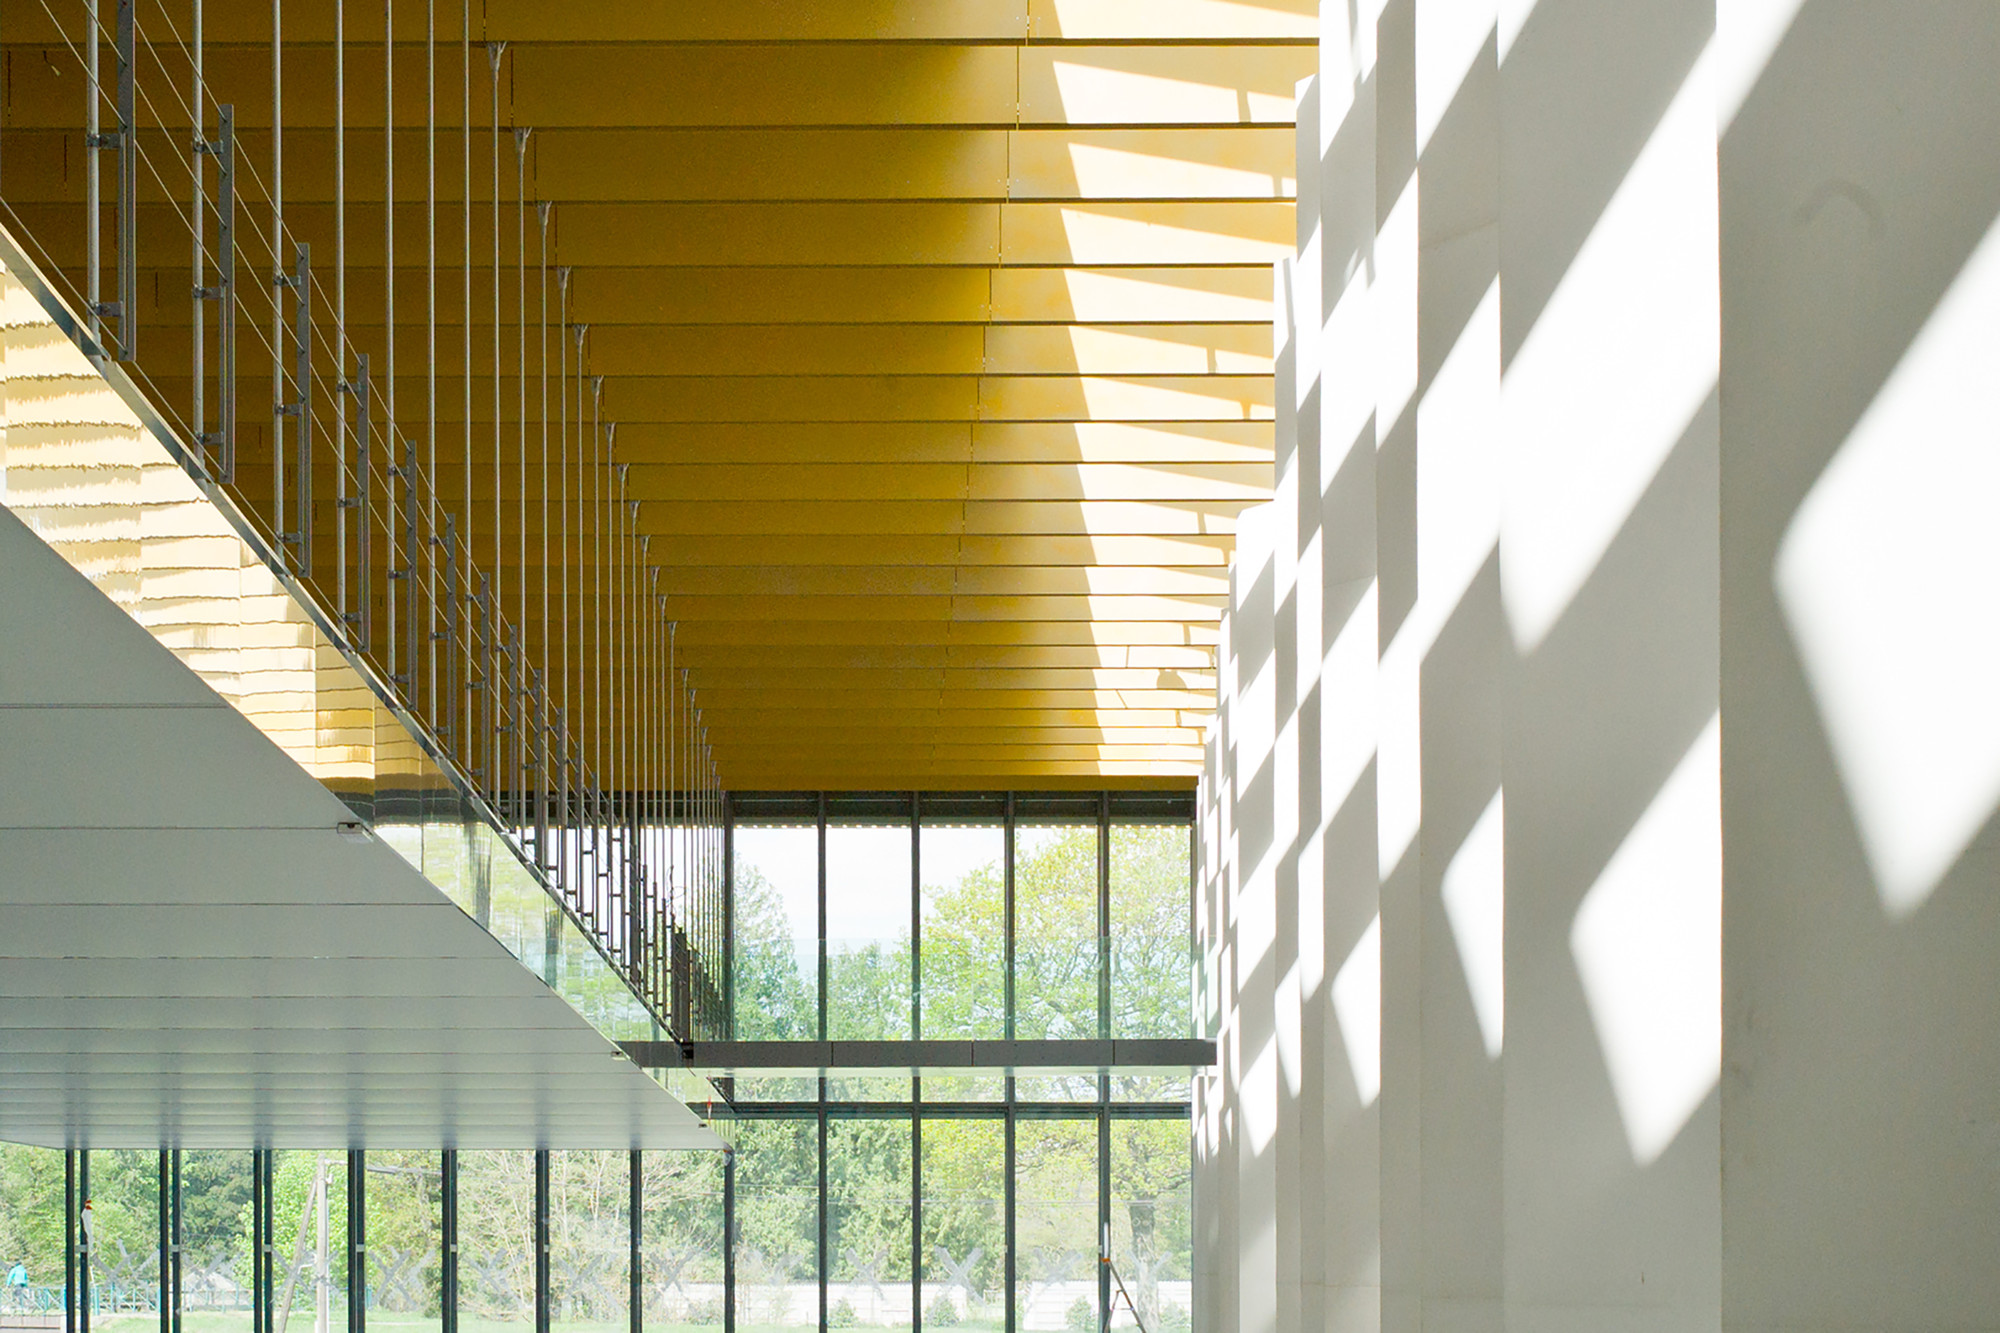 Gallery of Pontivy Media Library / Opus 5 architectes - 9